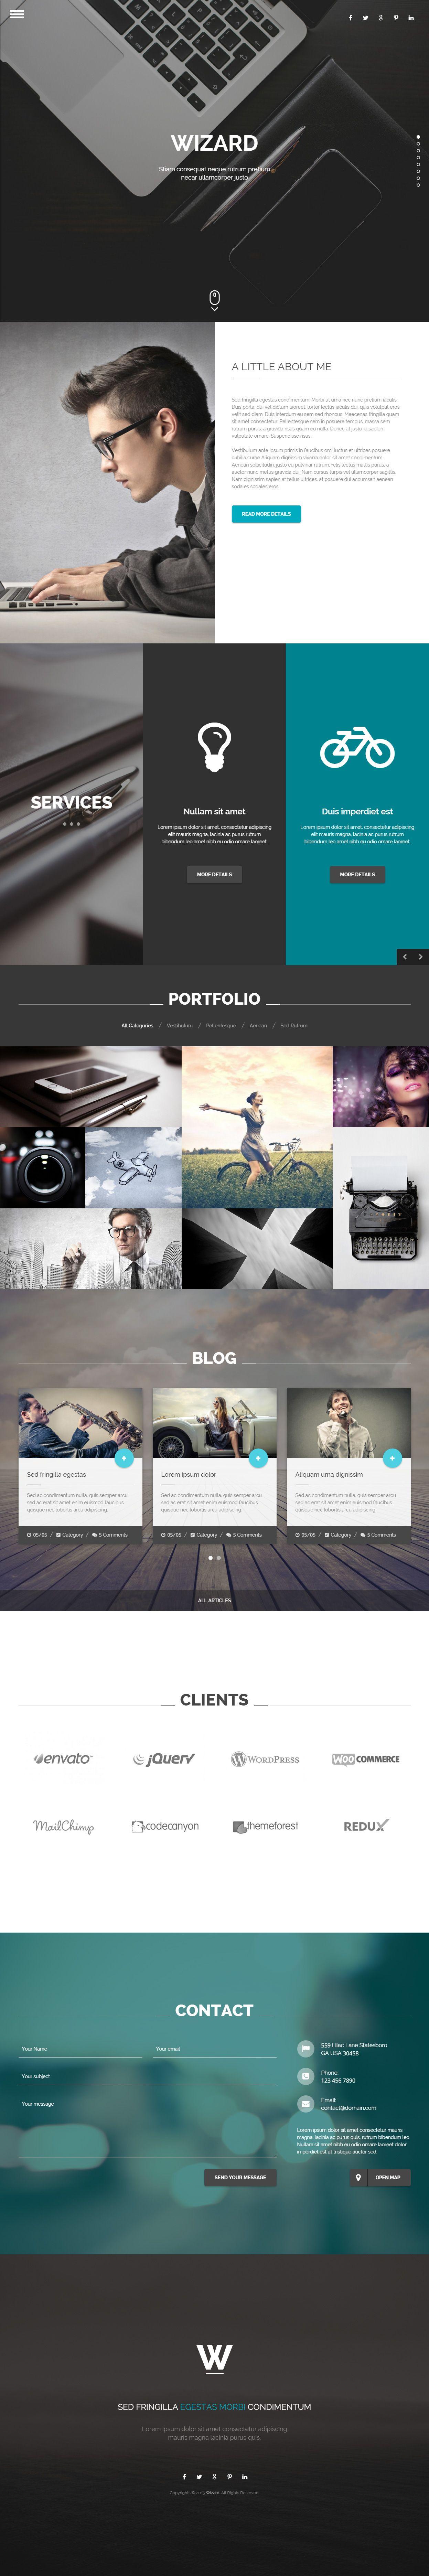 Wizard - Premium Responsive Portfolio HTML5 Template | Video ...